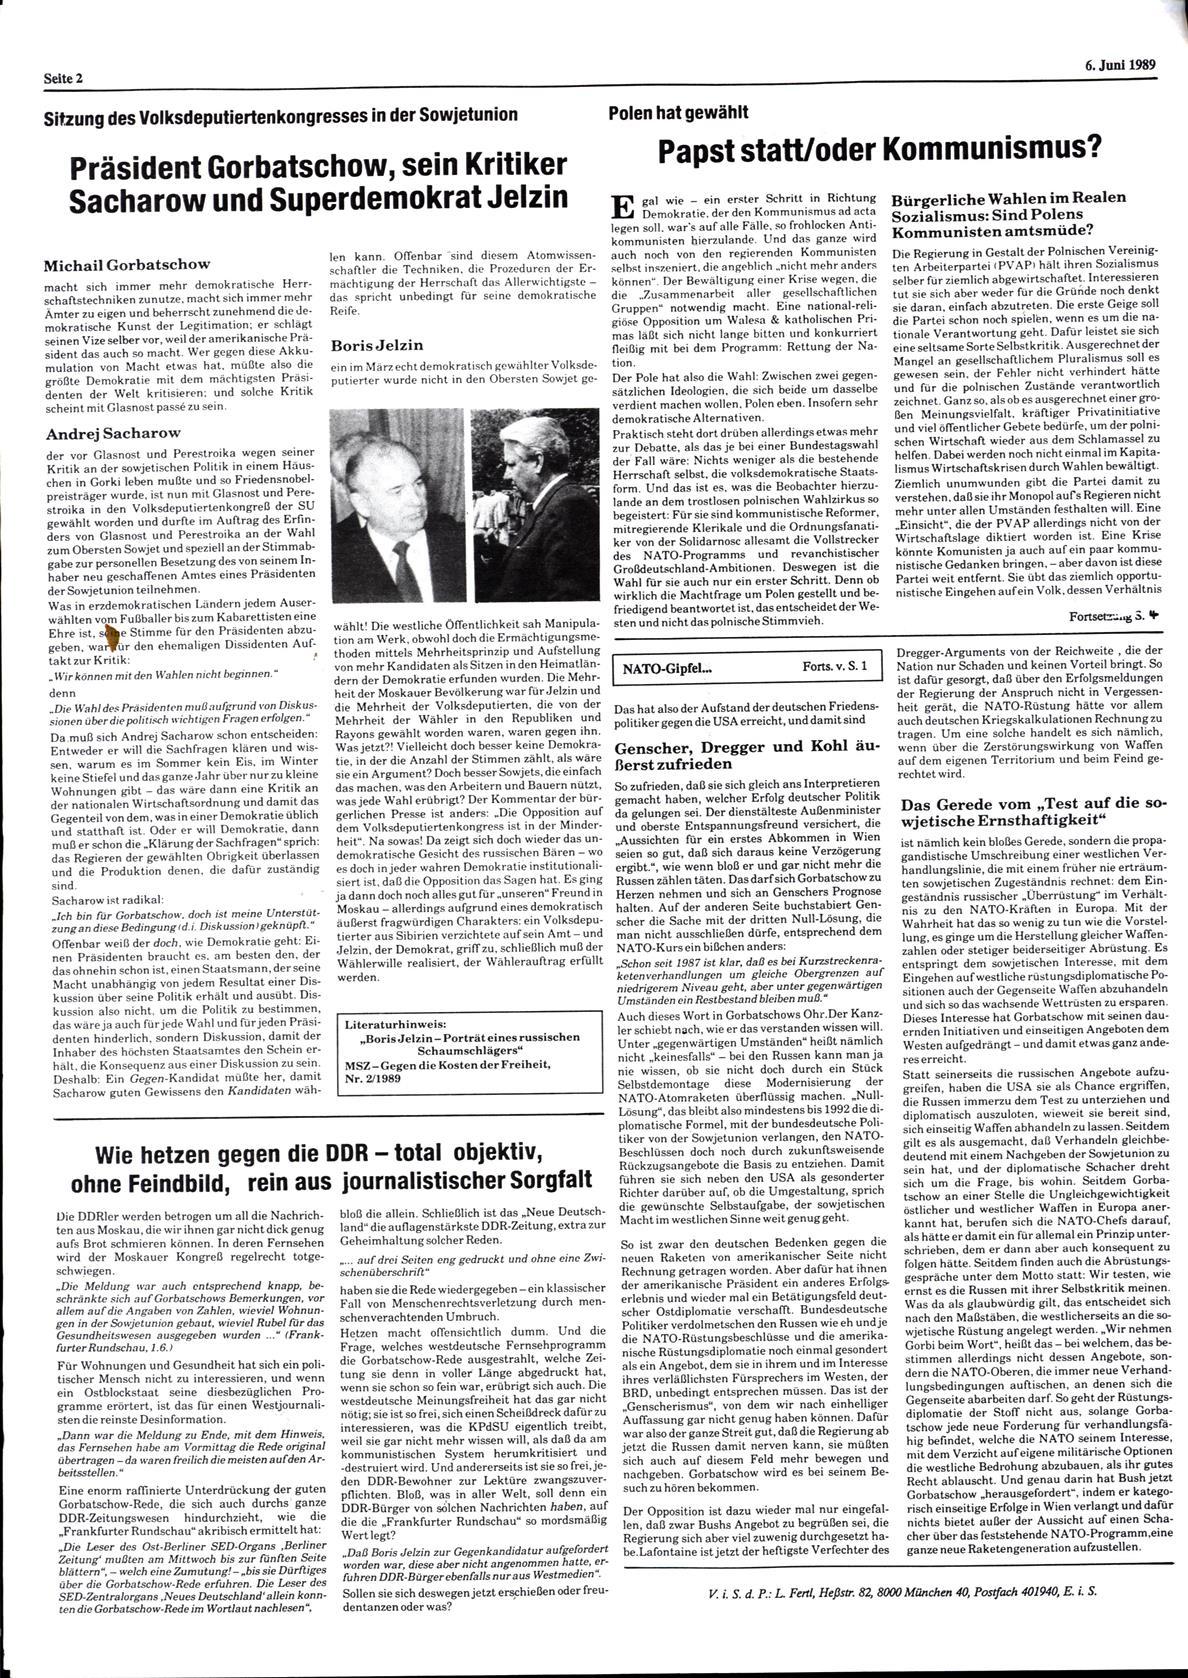 Bochum_BHZ_19890606_190_002